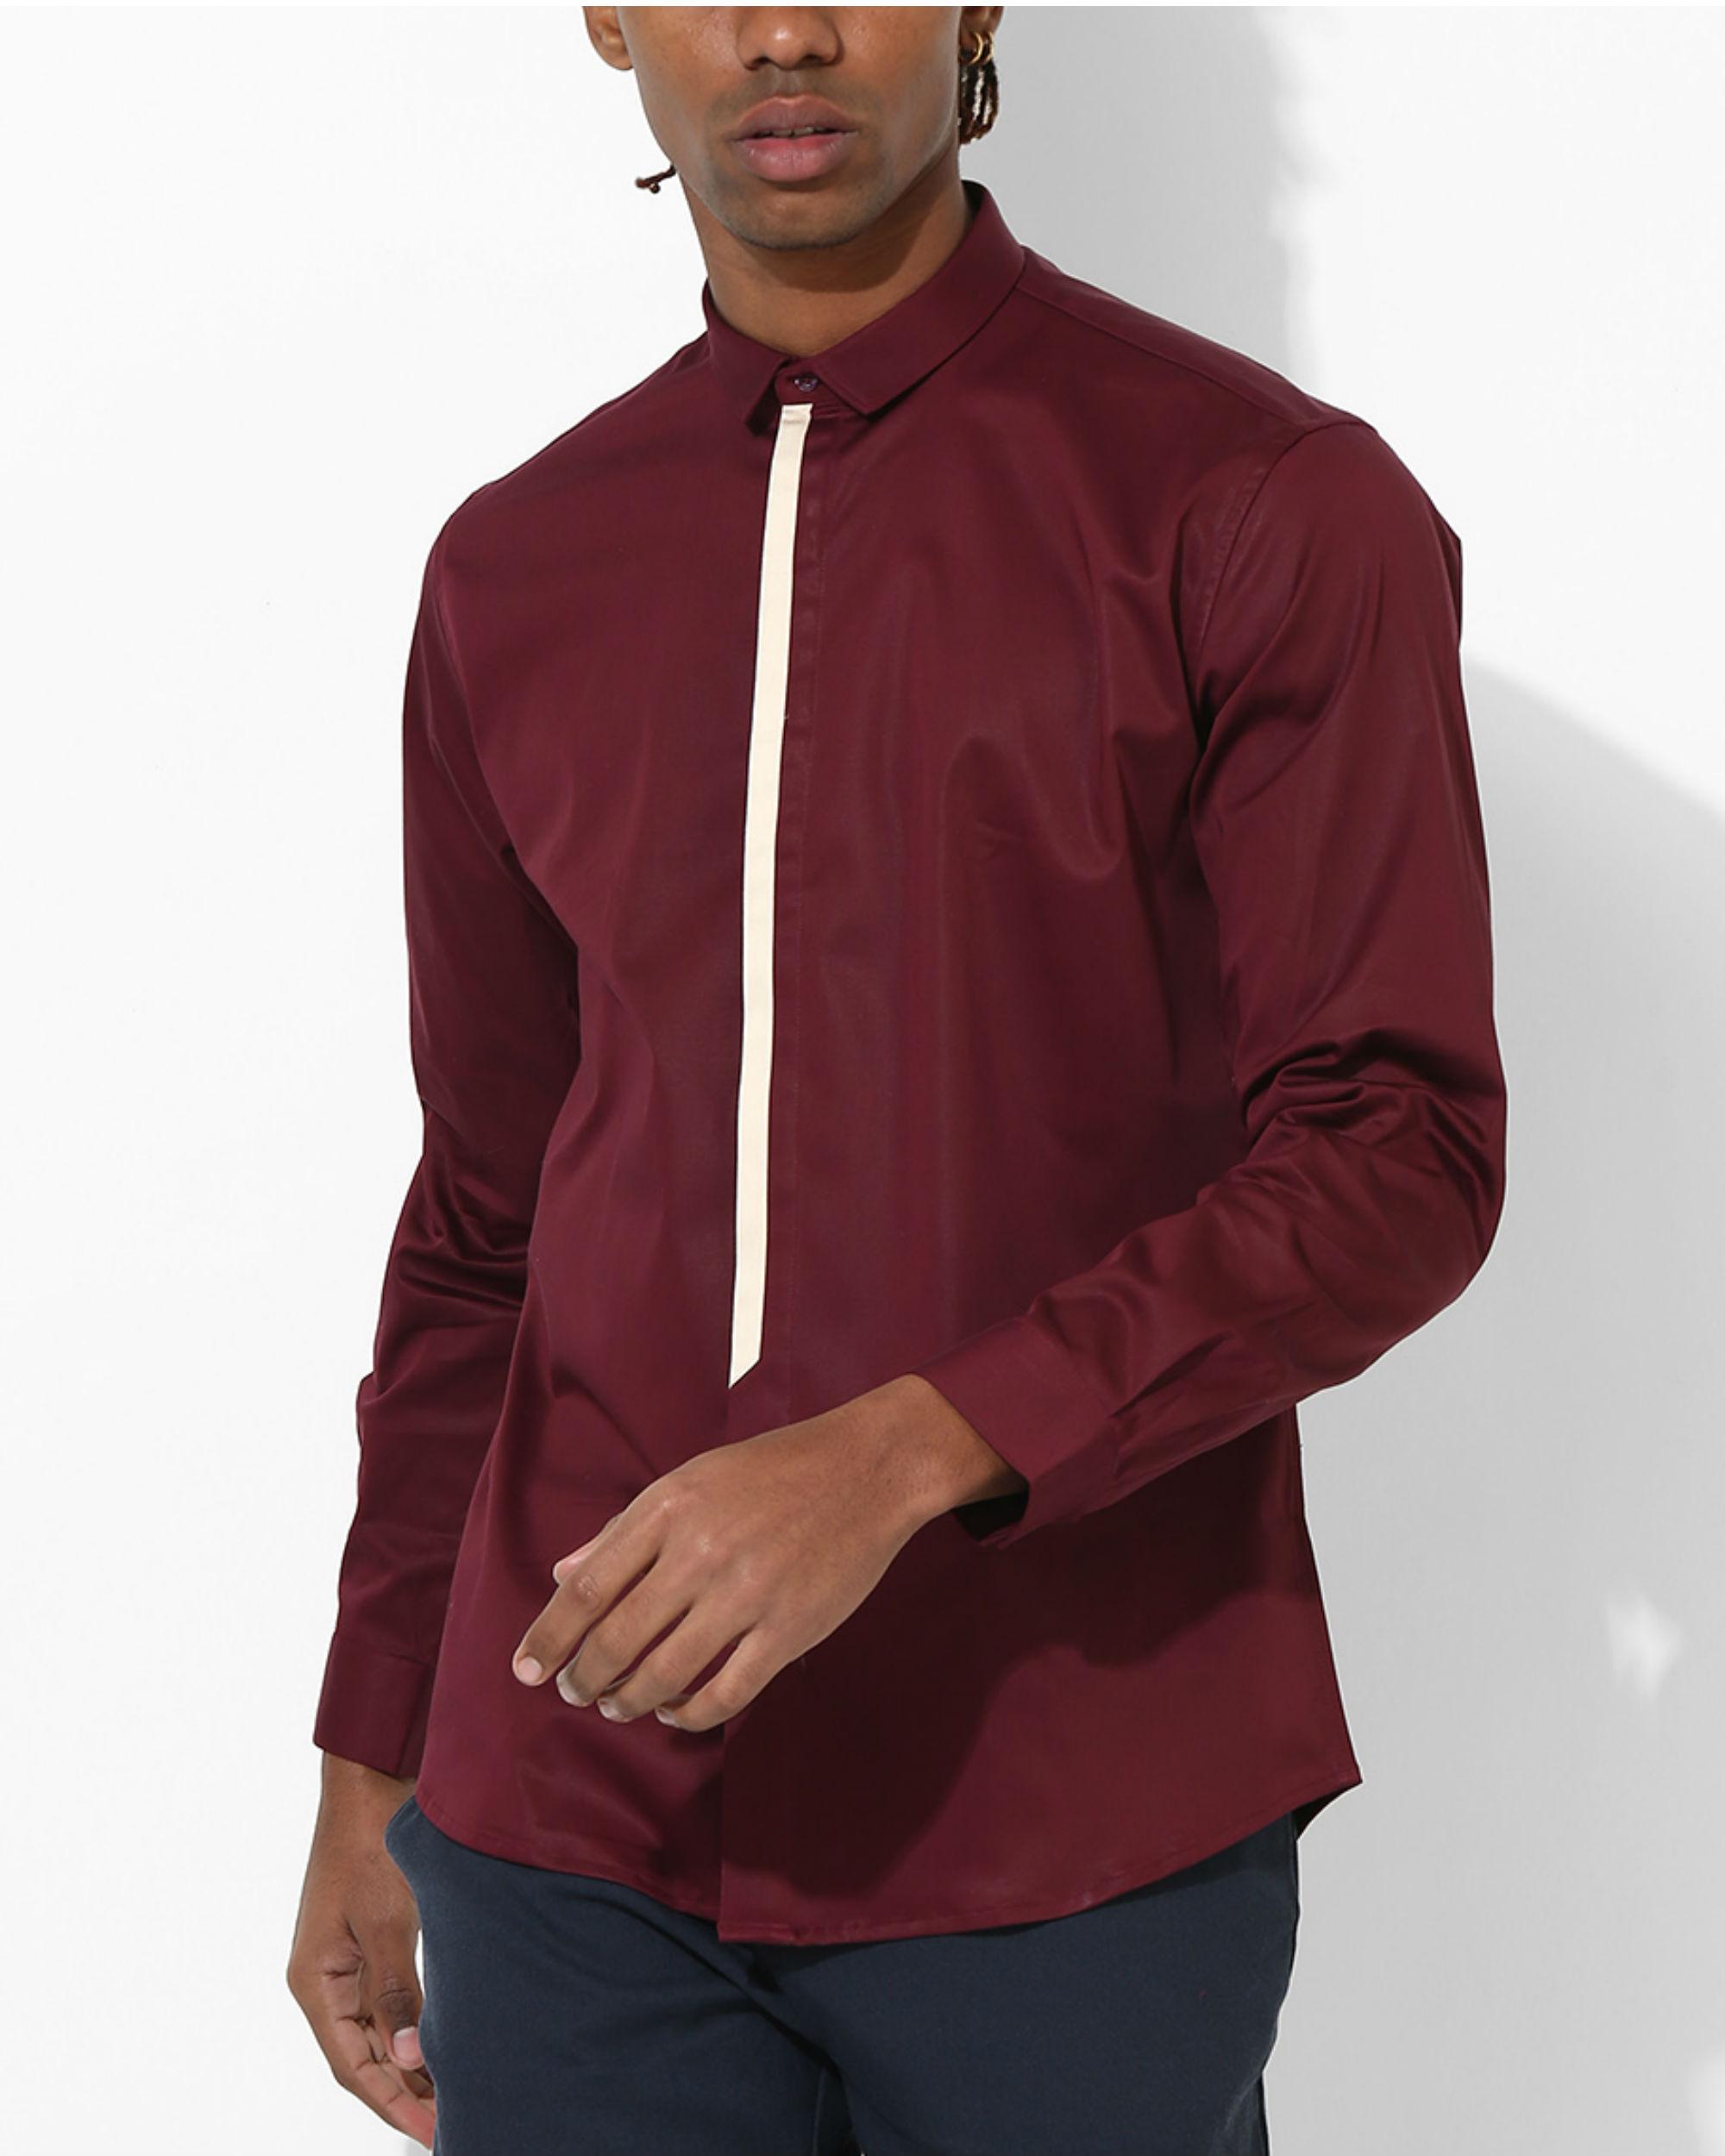 Maroon Beige stripe Shirt